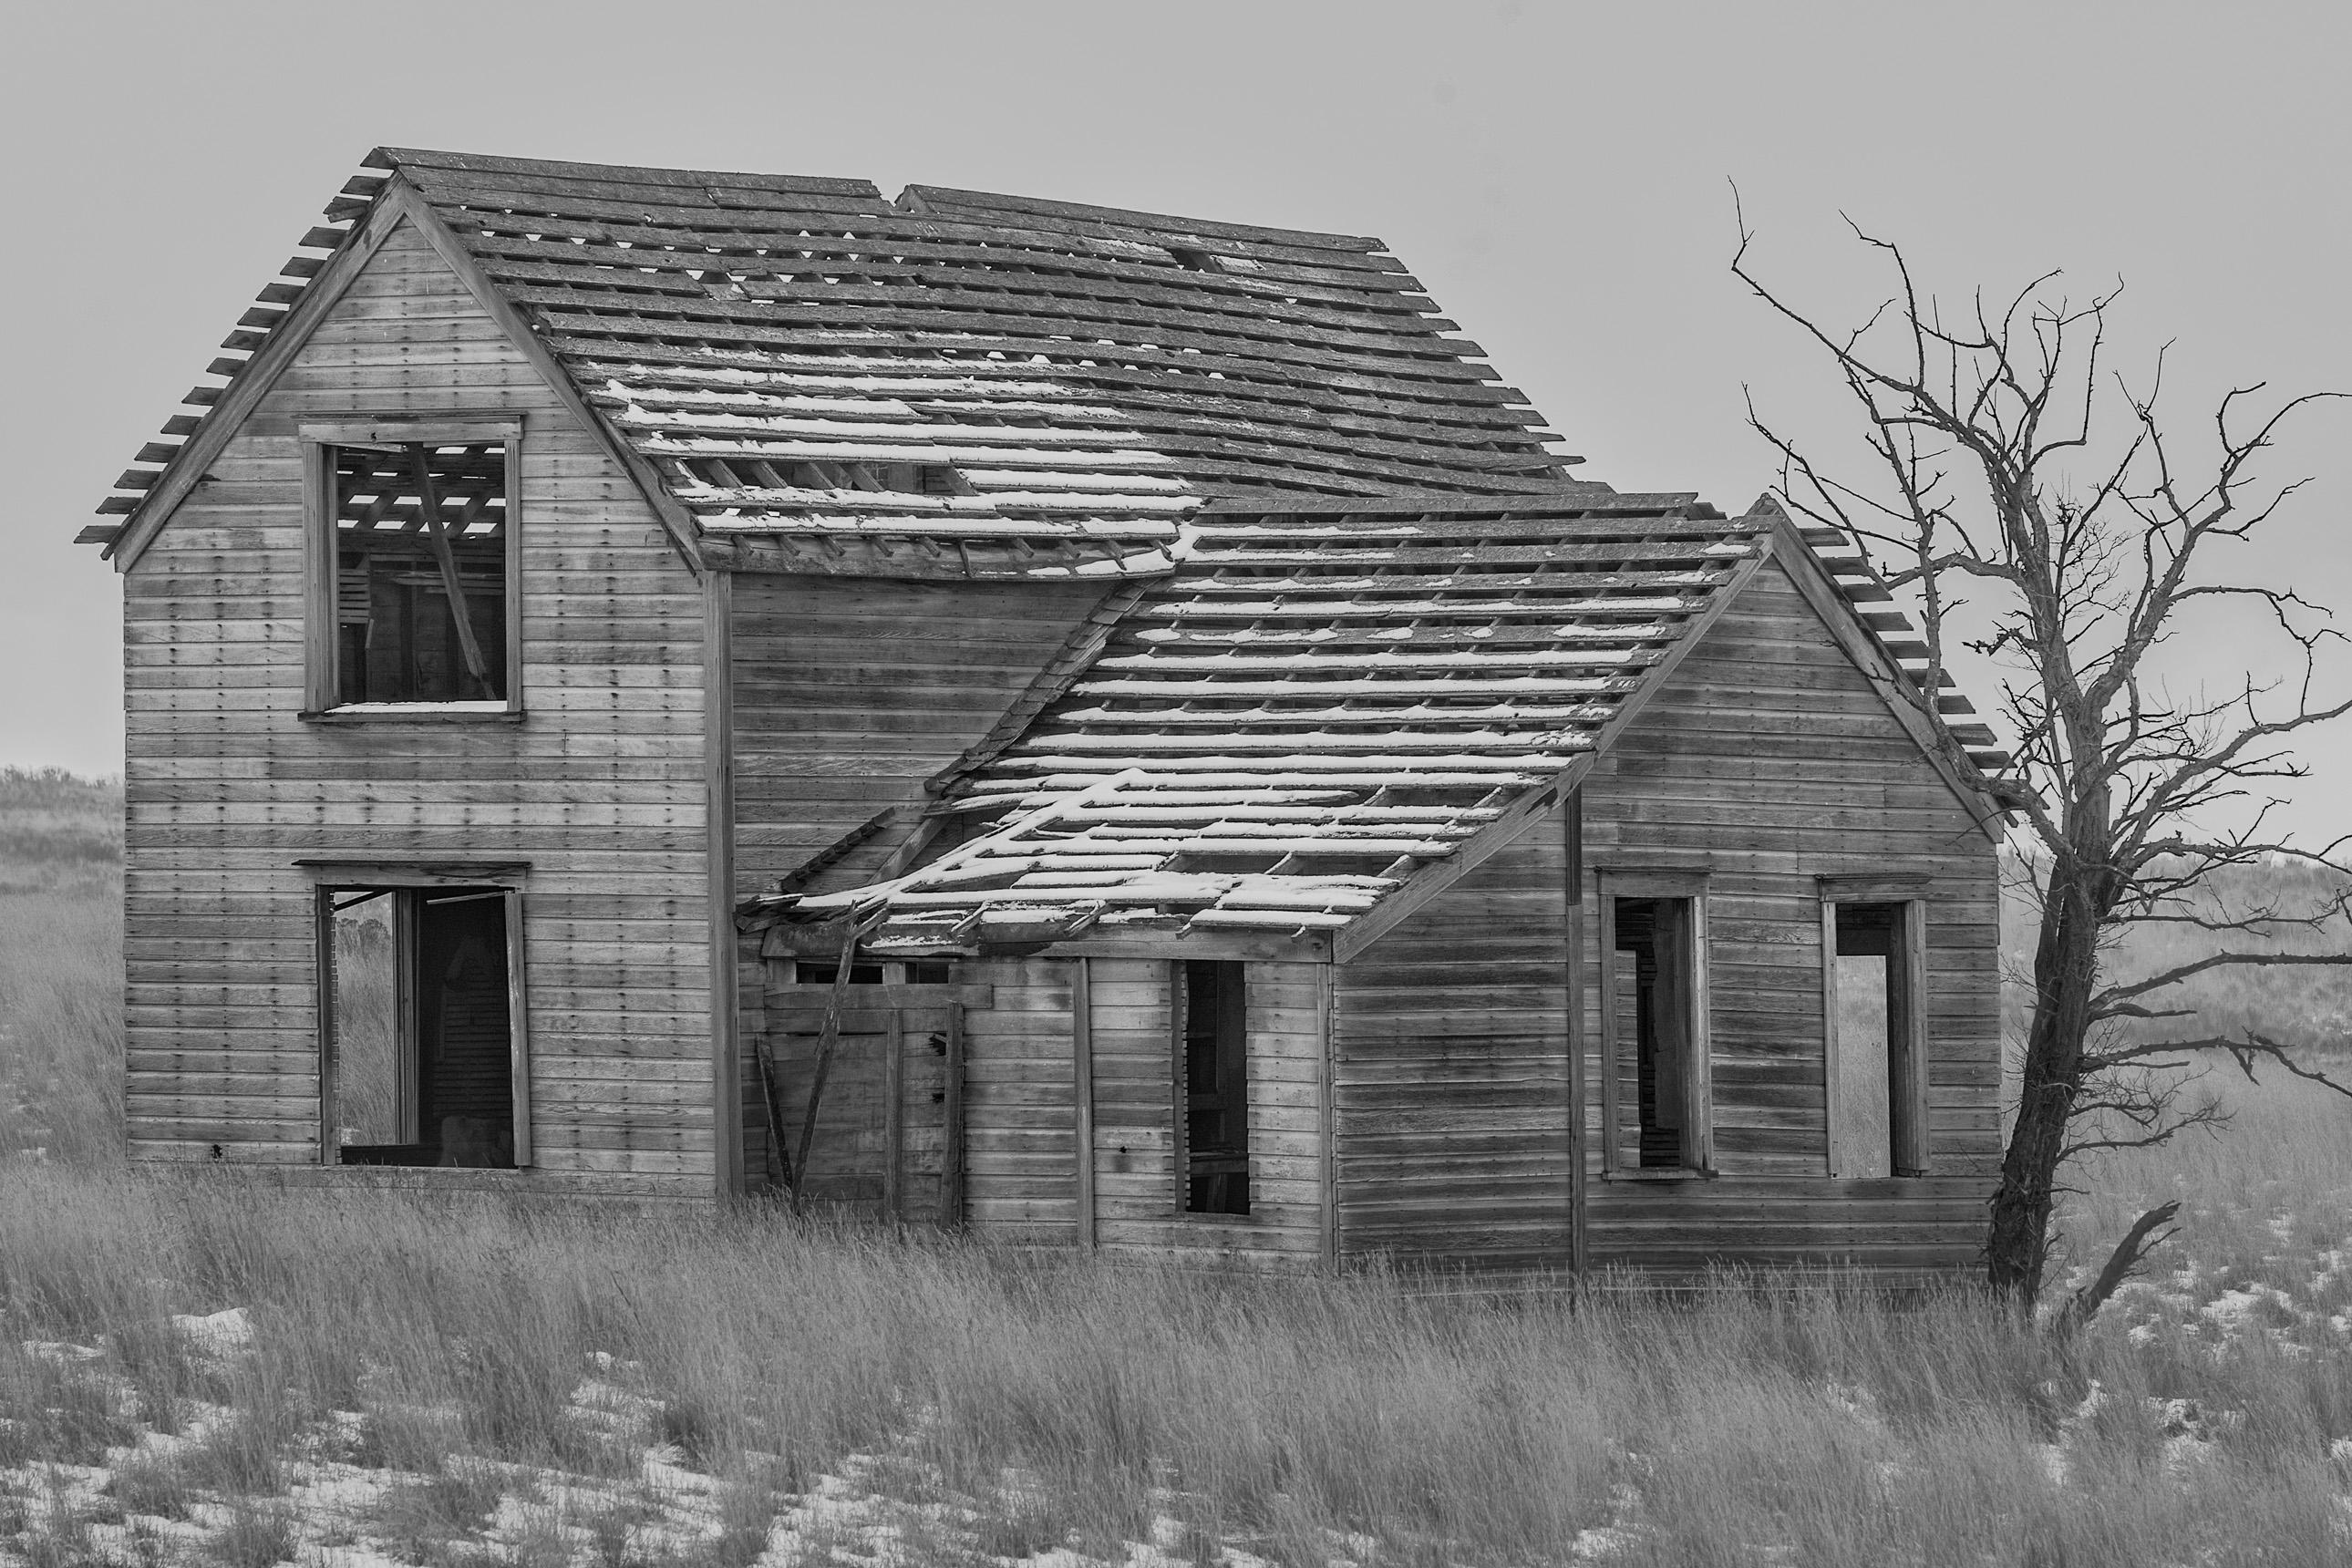 Creepy abandoned house on a farm